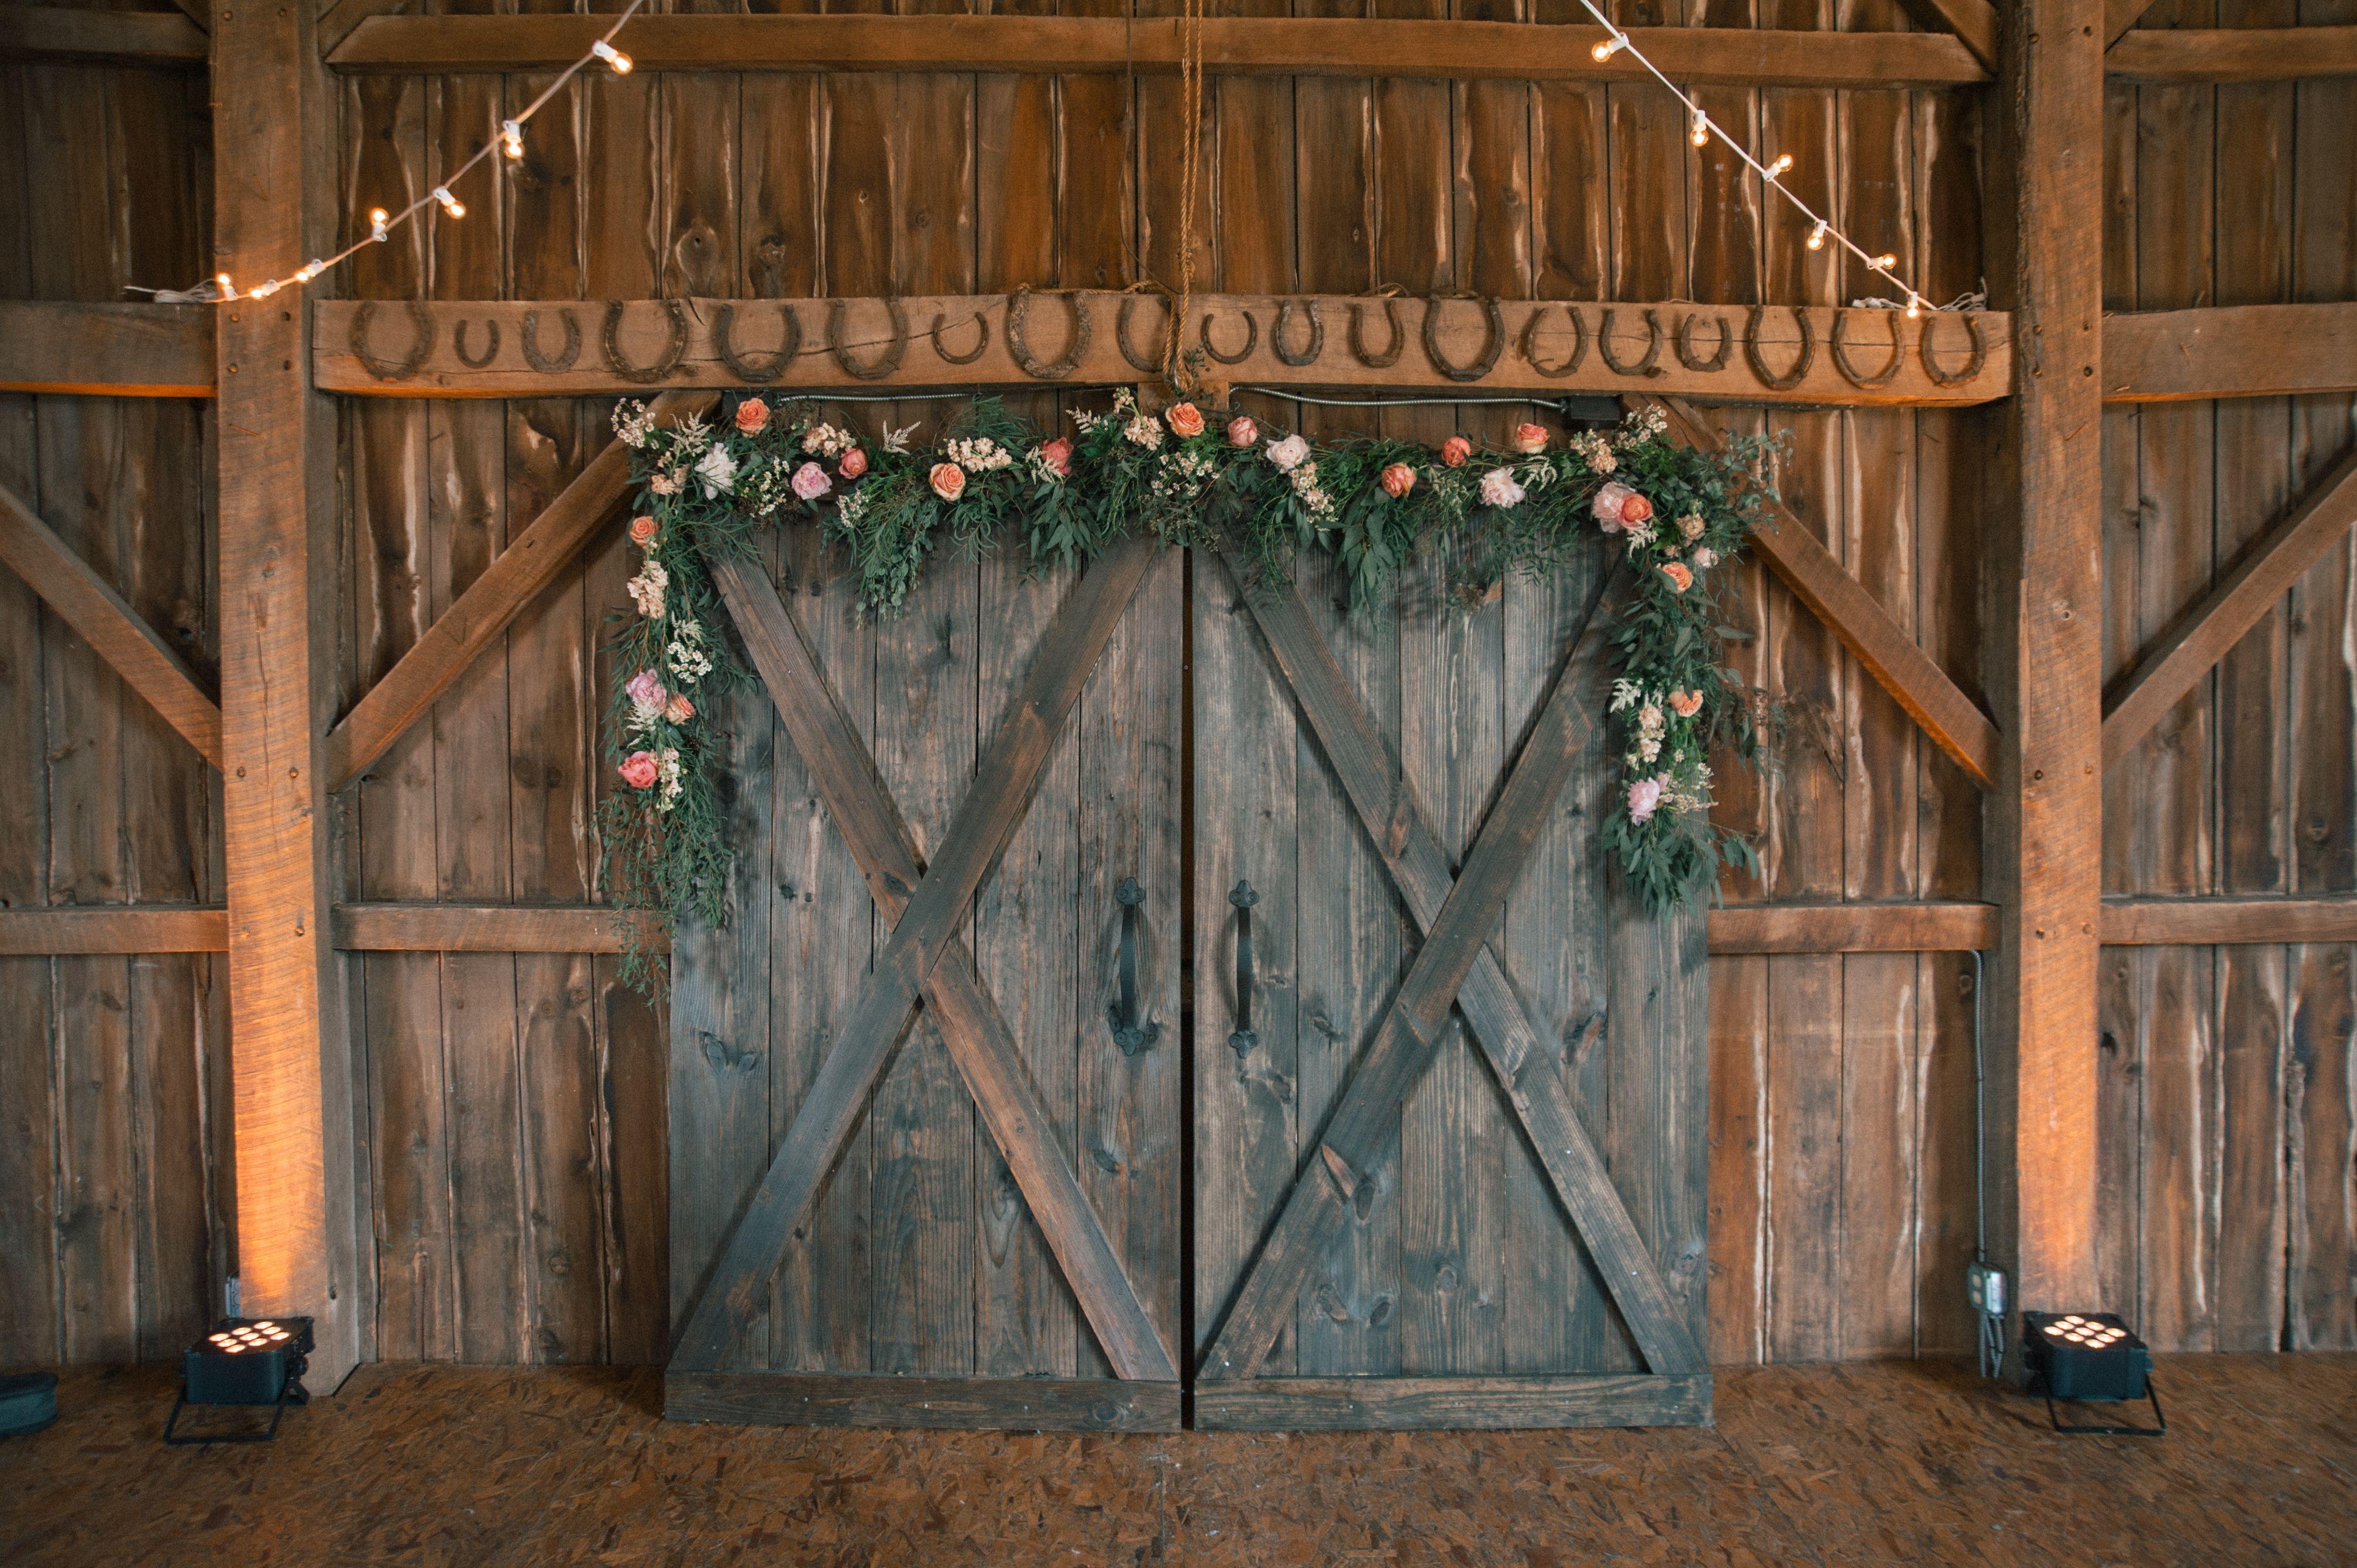 Rustic Barn Door Ceremony Backdrop Barn Door Wedding Backyard